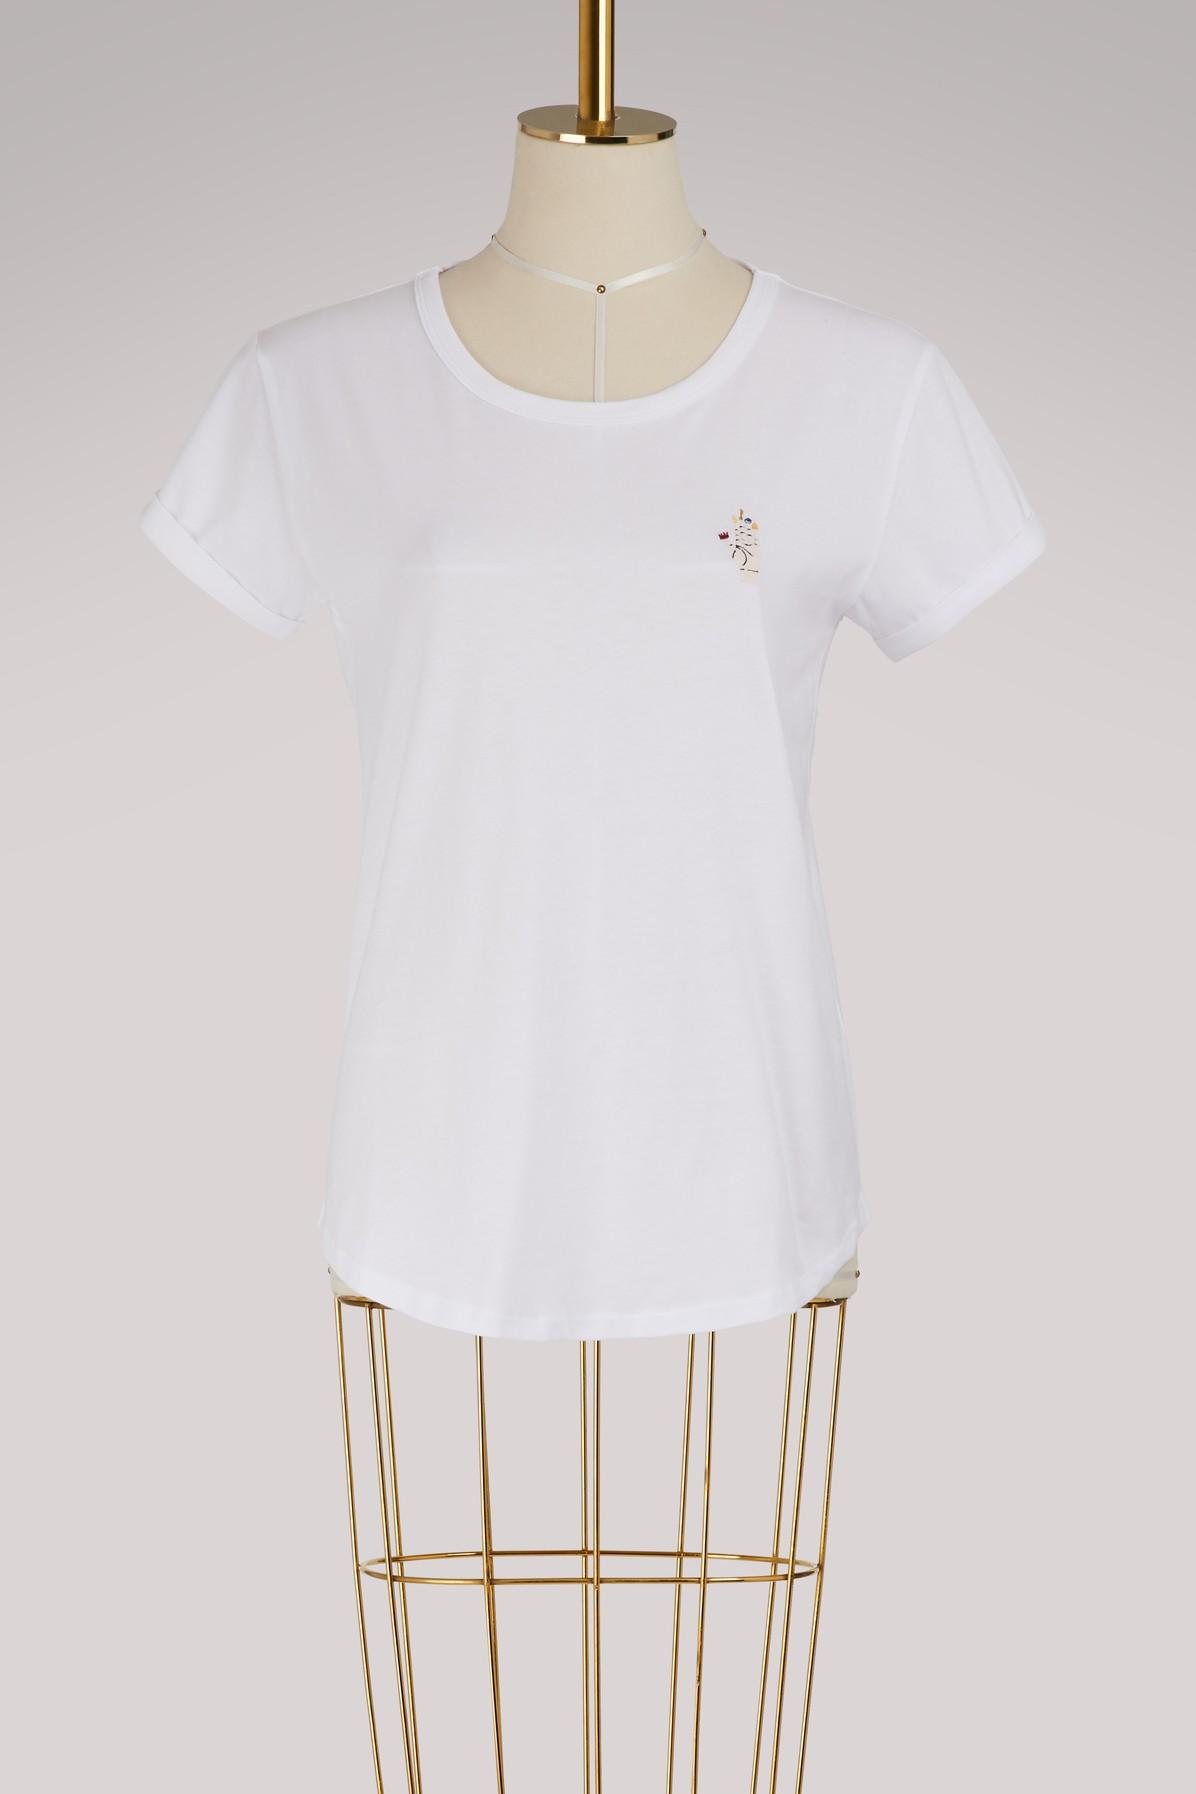 Maison Labiche Mystic Hand Cotton T-shirt In White